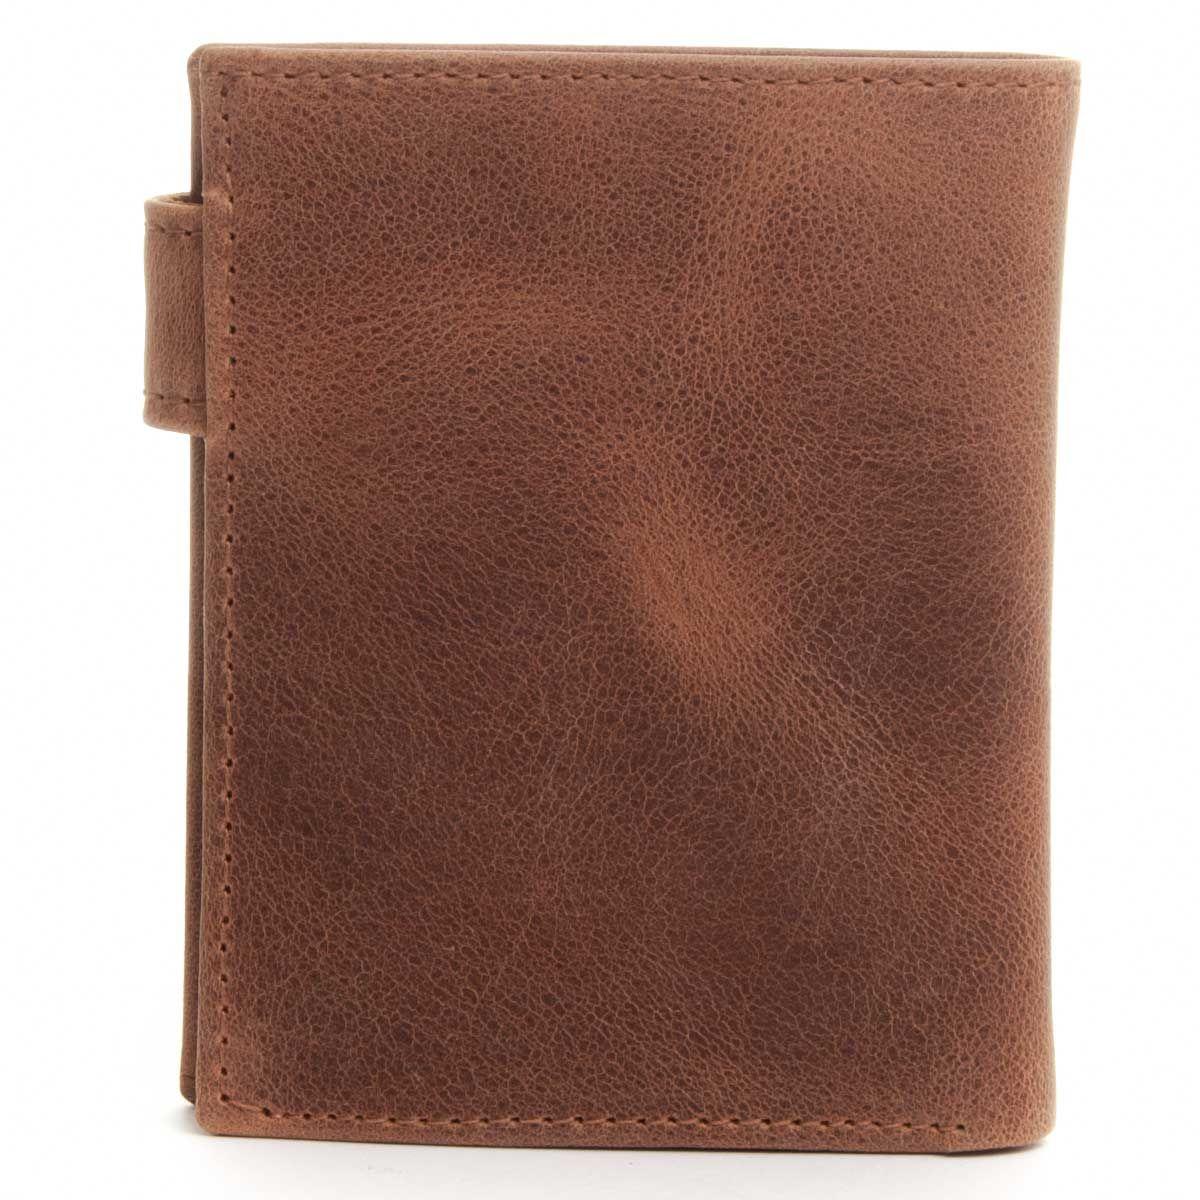 Montevita Leather Wallet in Camel